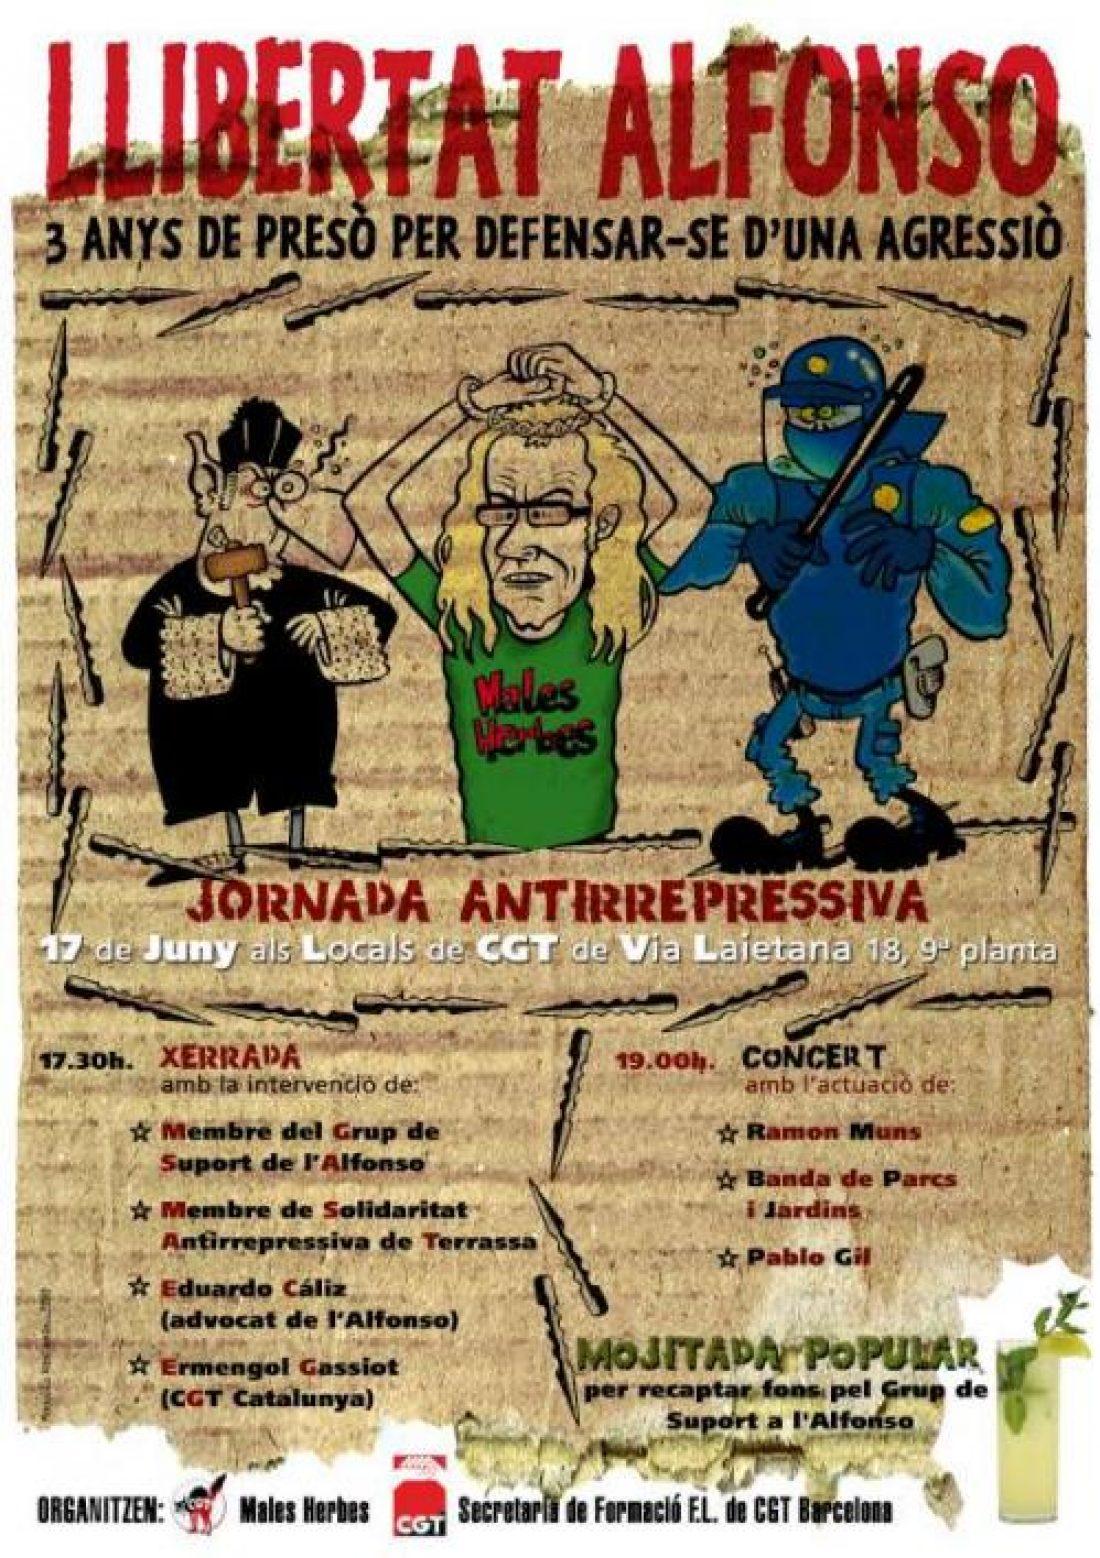 Barcelona, 17 de Junio: Jornada Antirepresiva: Libertad Alfonso